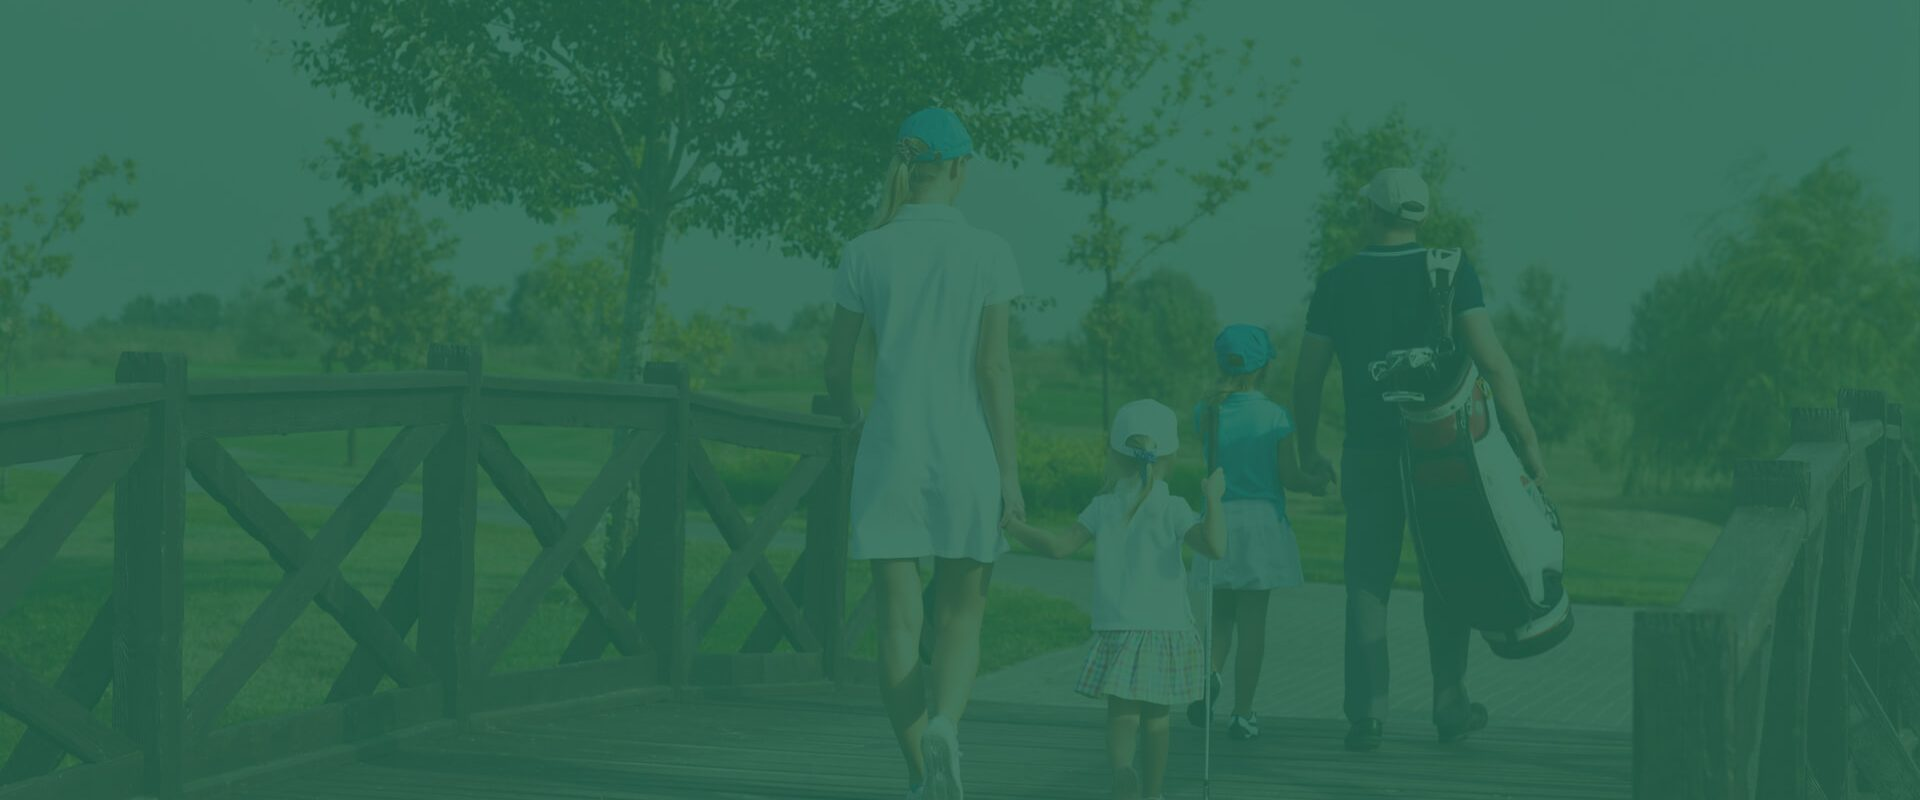 familia caminando or campo de golf